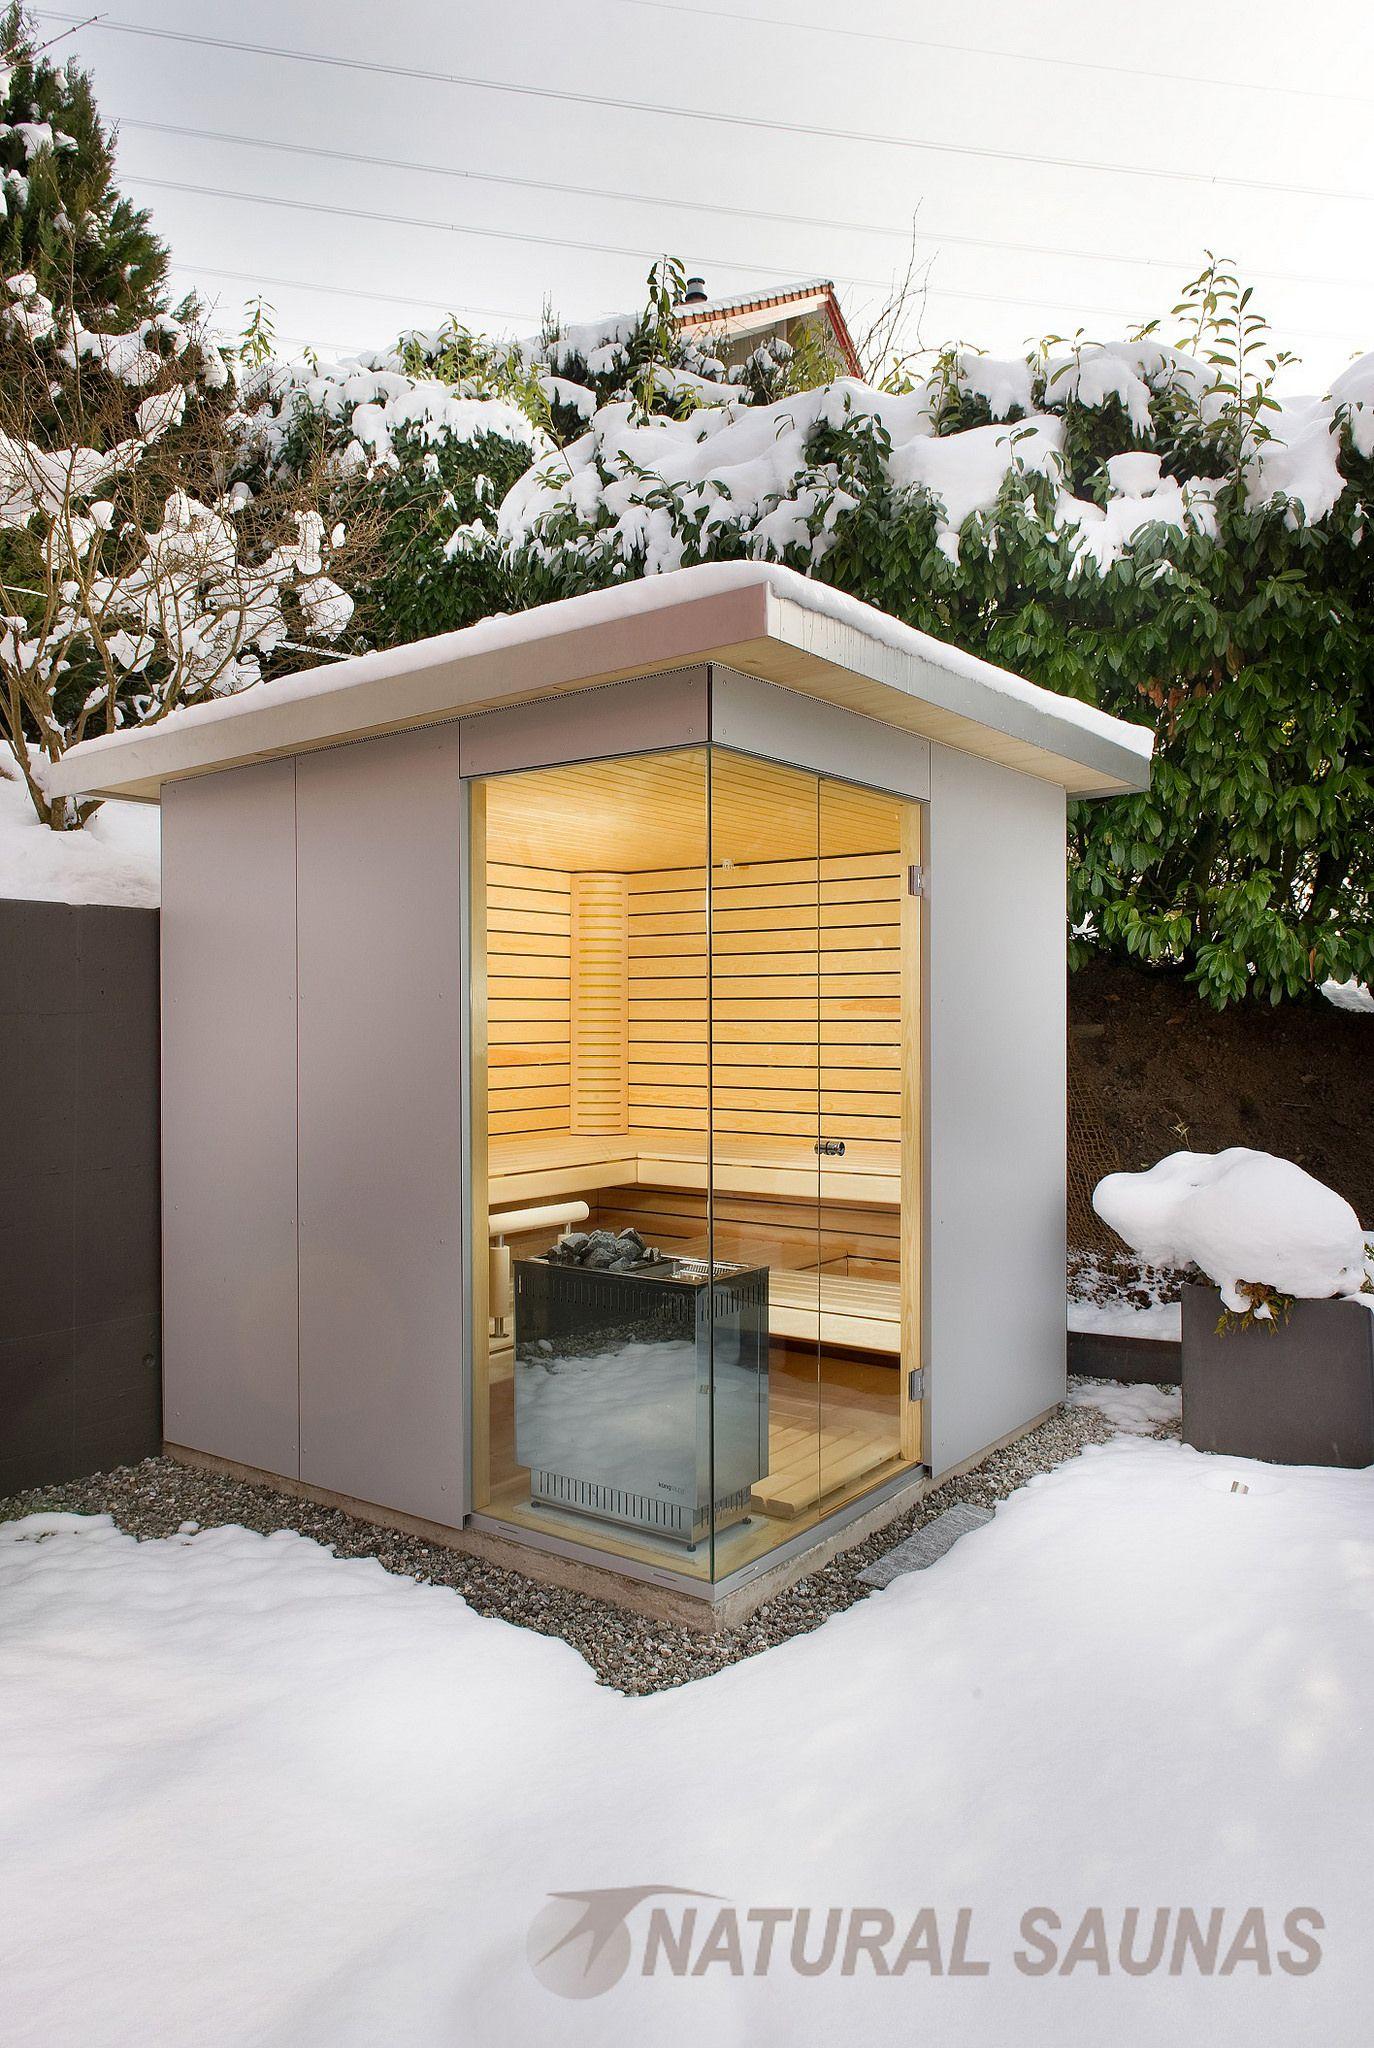 Saunas De Exterior Outdoor Sauna Sauna Design Sauna Room